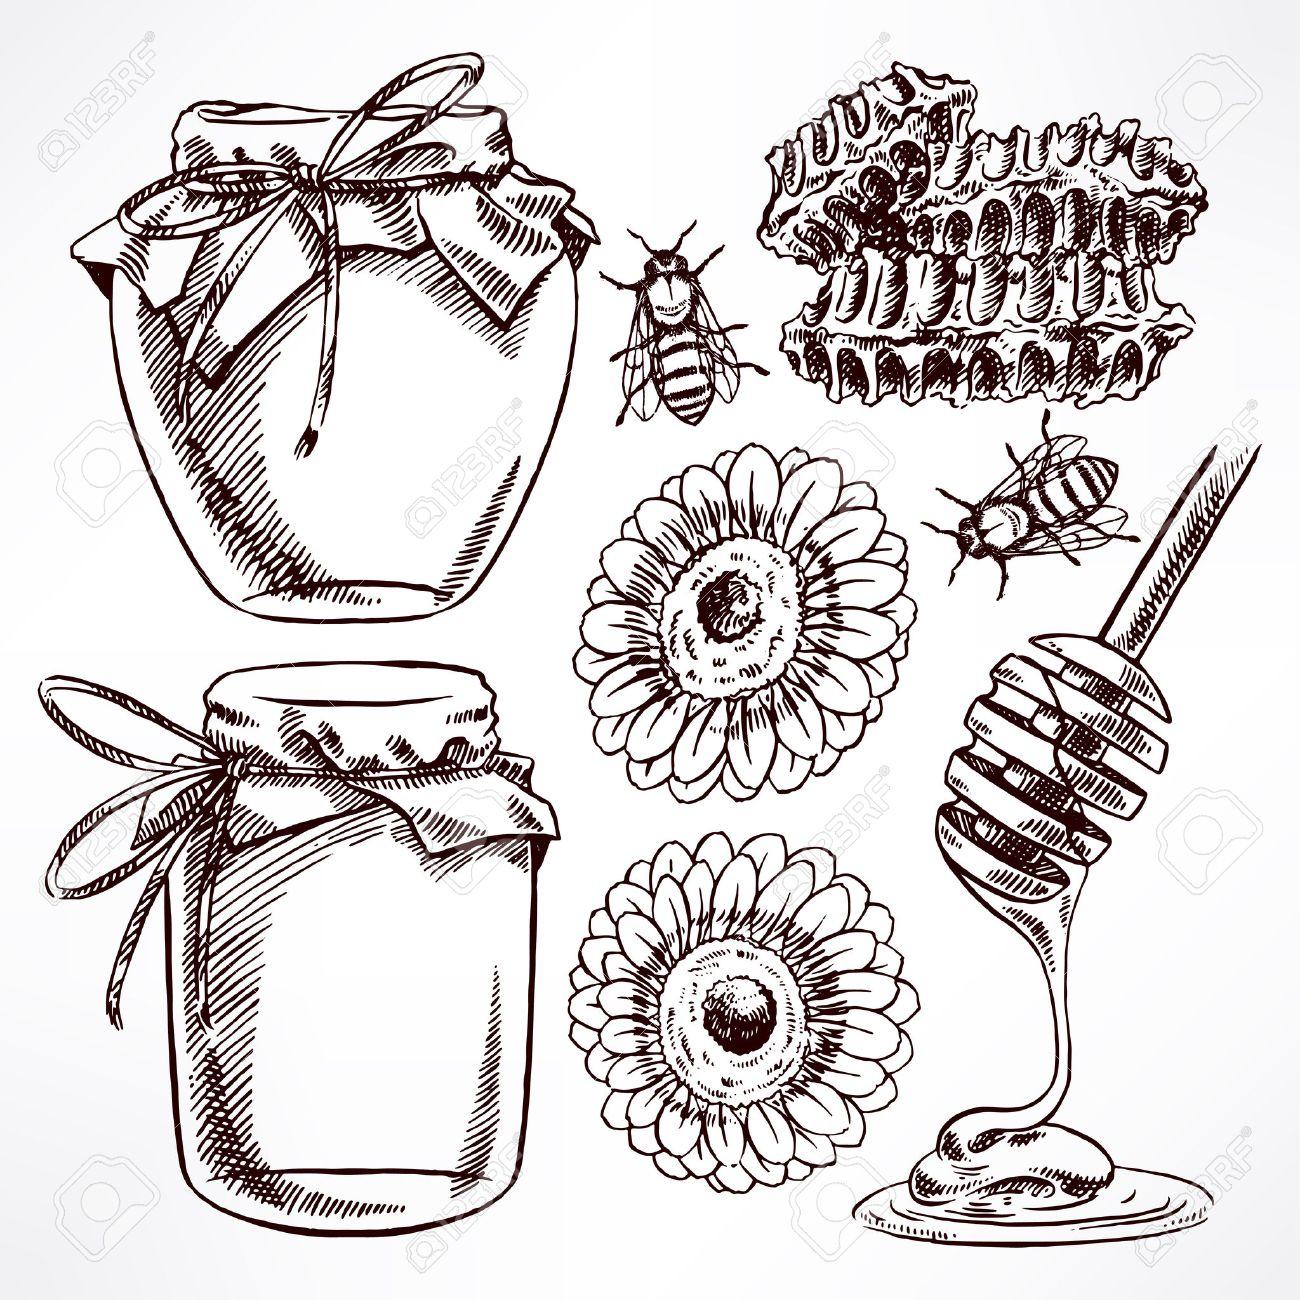 sketch honey set. jars of honey, bees, honeycomb. hand-drawn illustration - 39894178